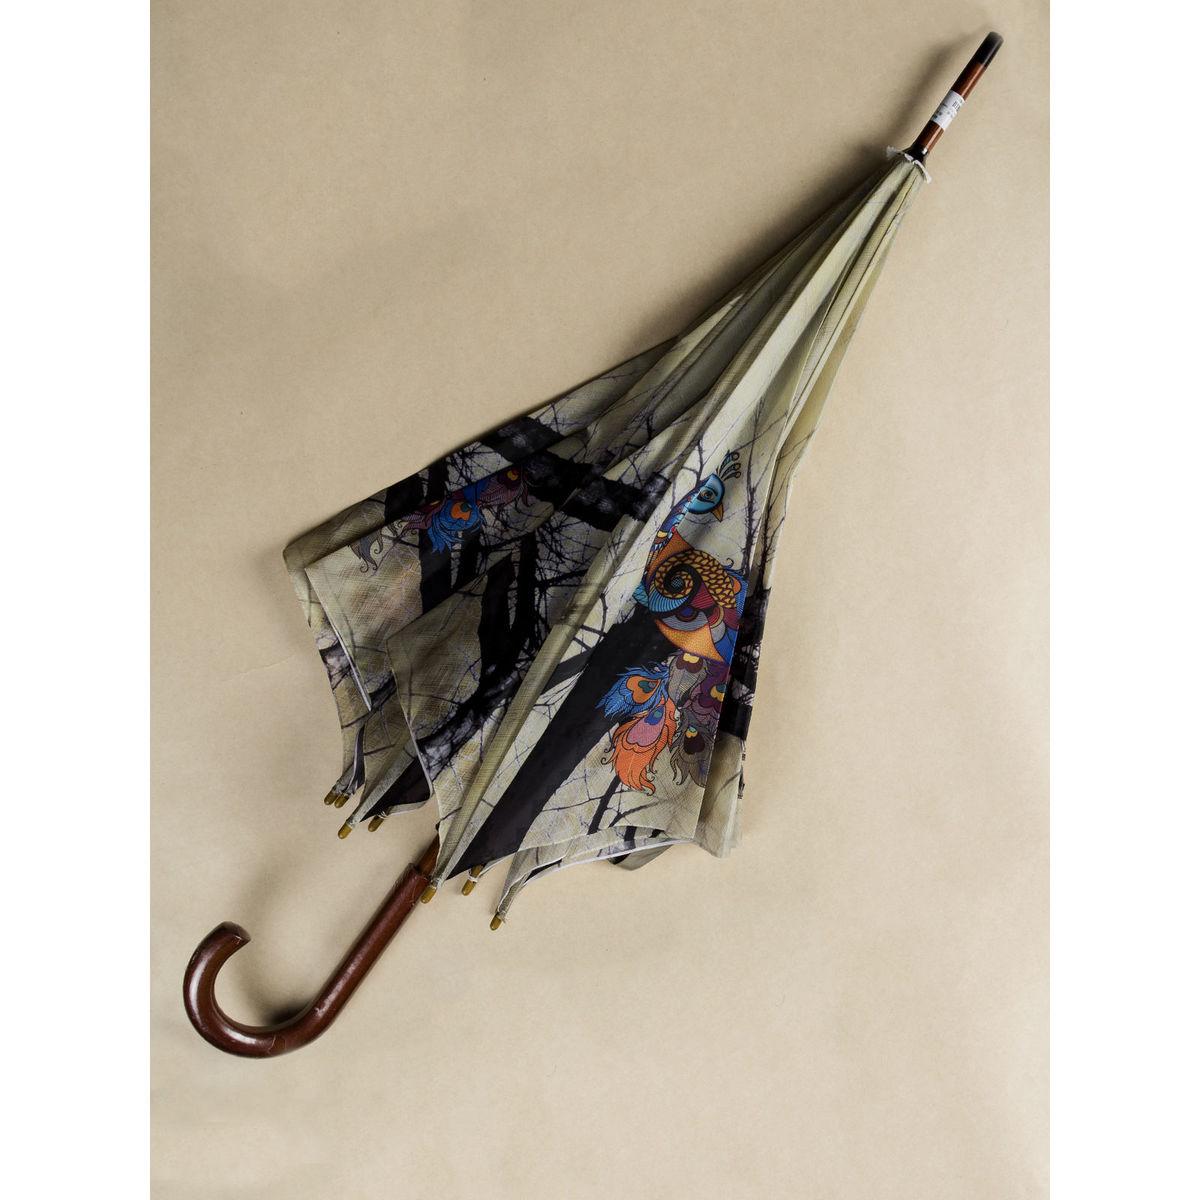 Teal Peacock umbrella